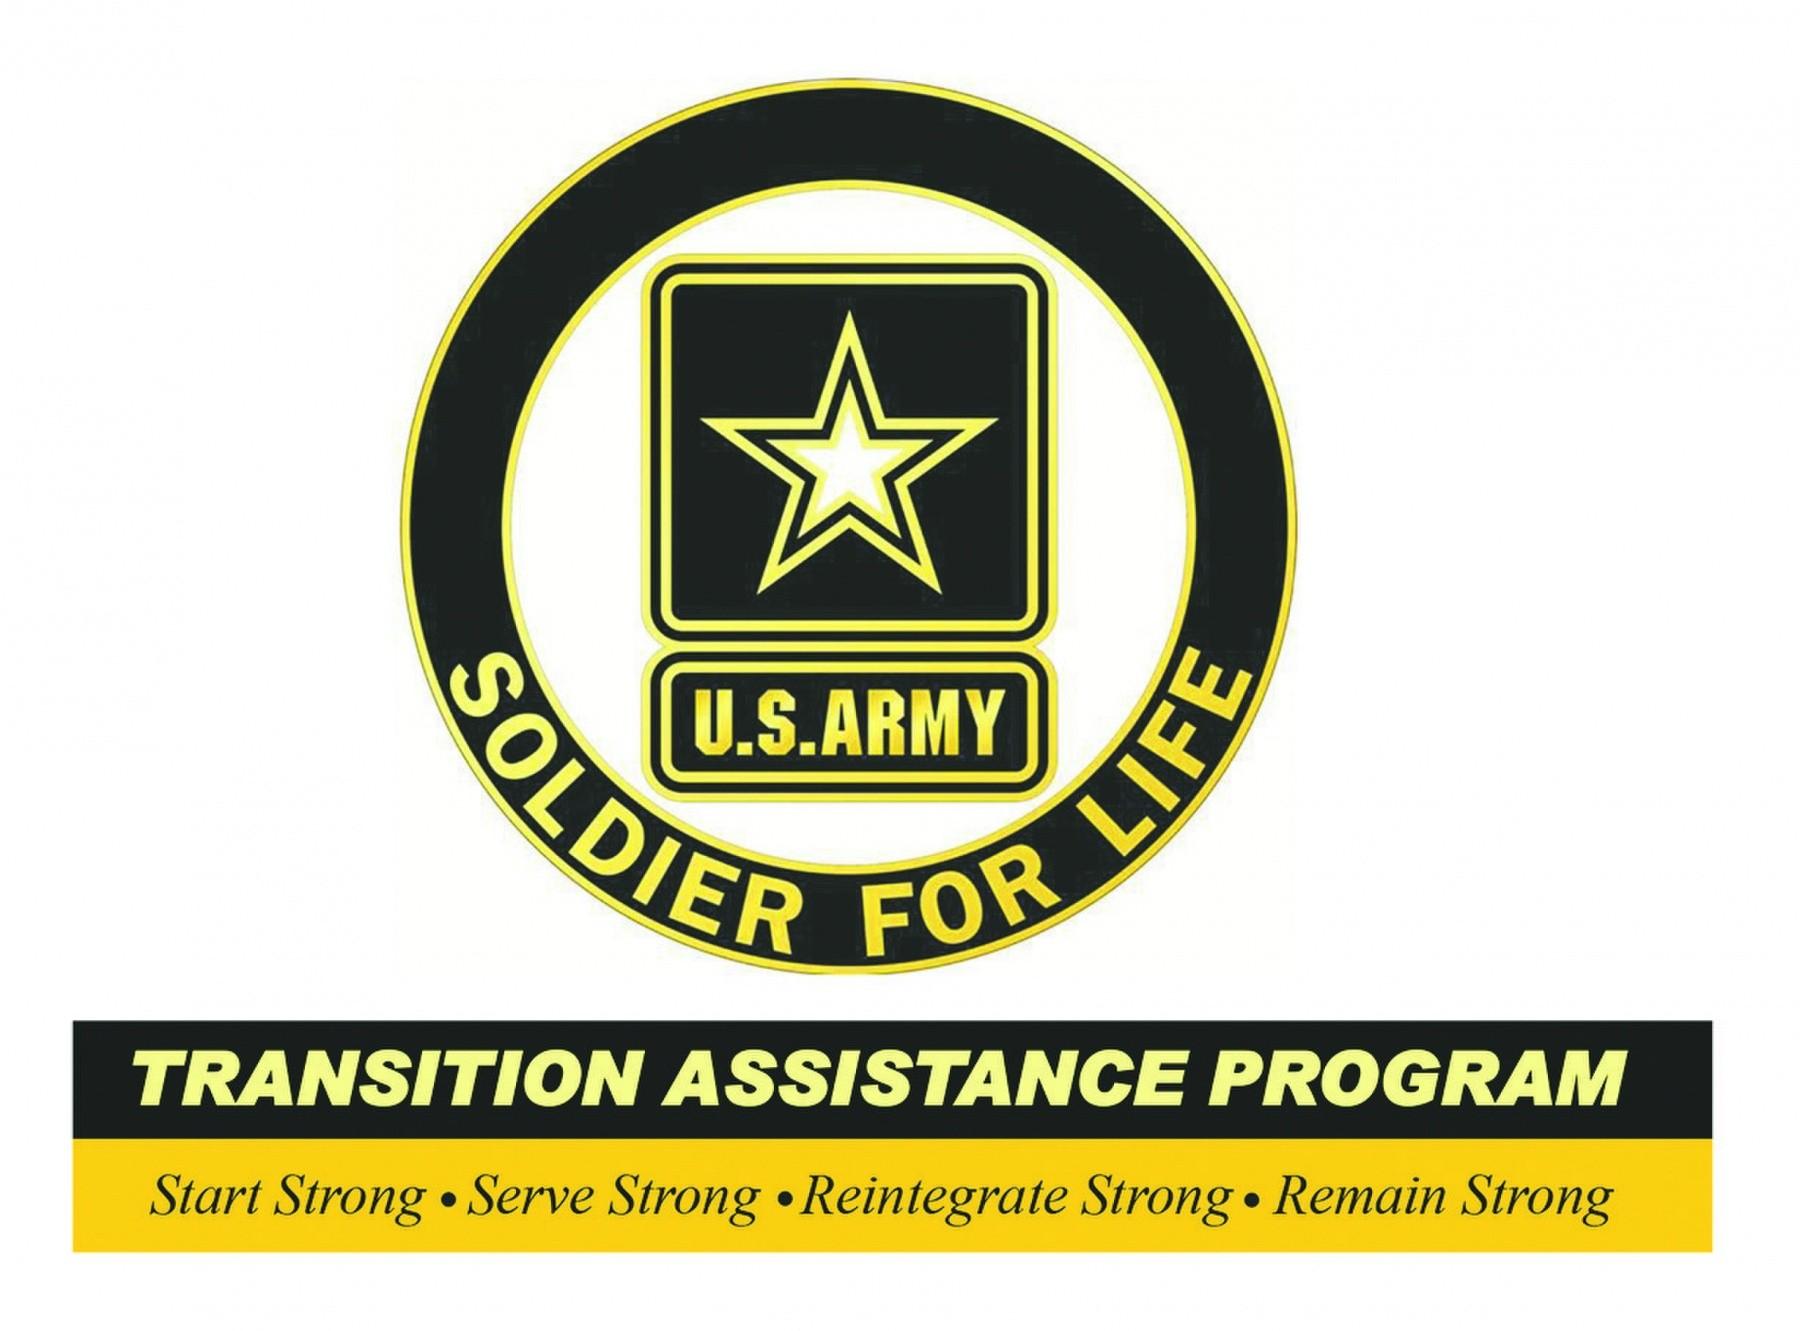 career skills program to help transitioning service